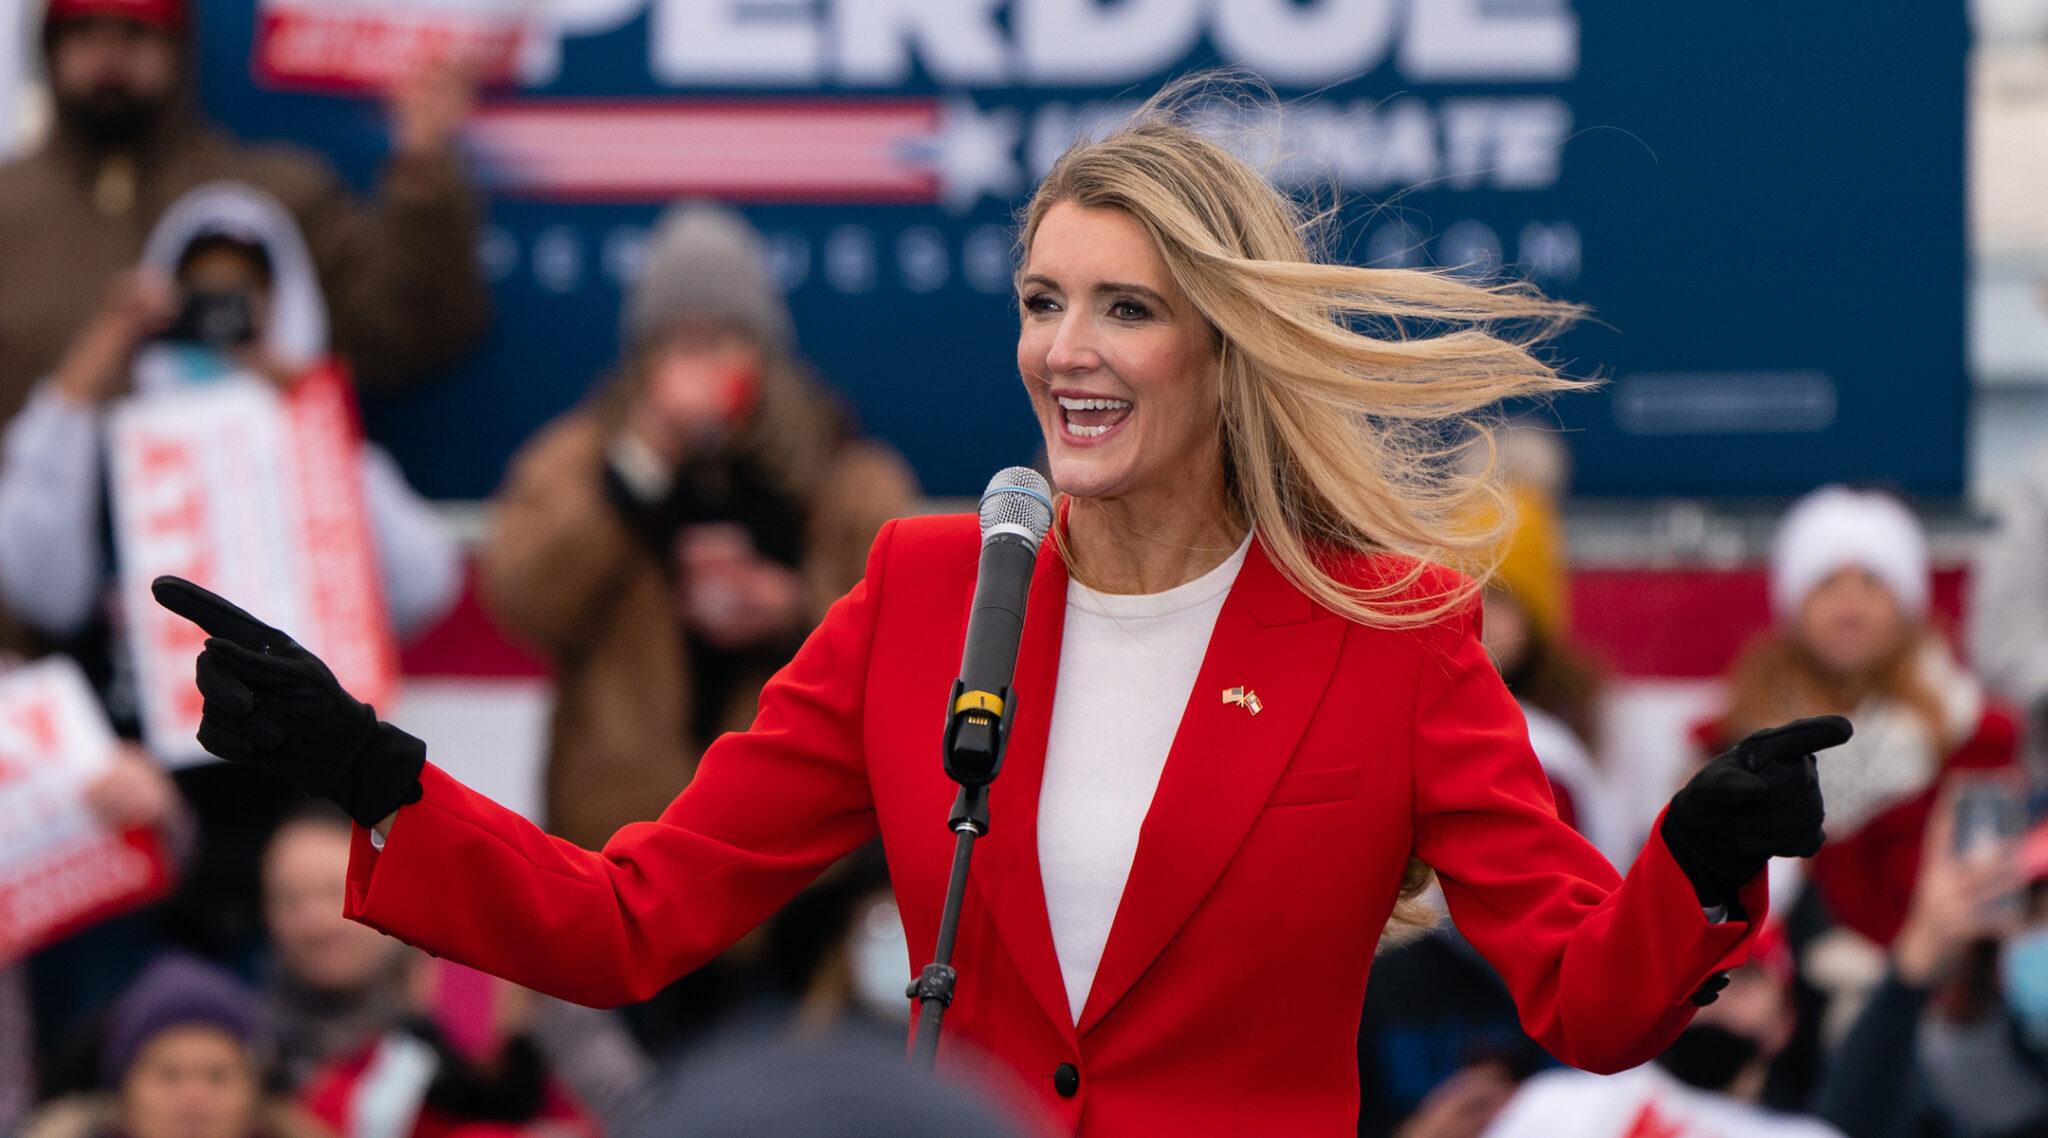 Sen. Kelly Loeffler speaks at a campaign event in Columbus, Georgia, Dec. 17, 2020. (Photo/JTA-Elijah Nouvelage-Getty Images)